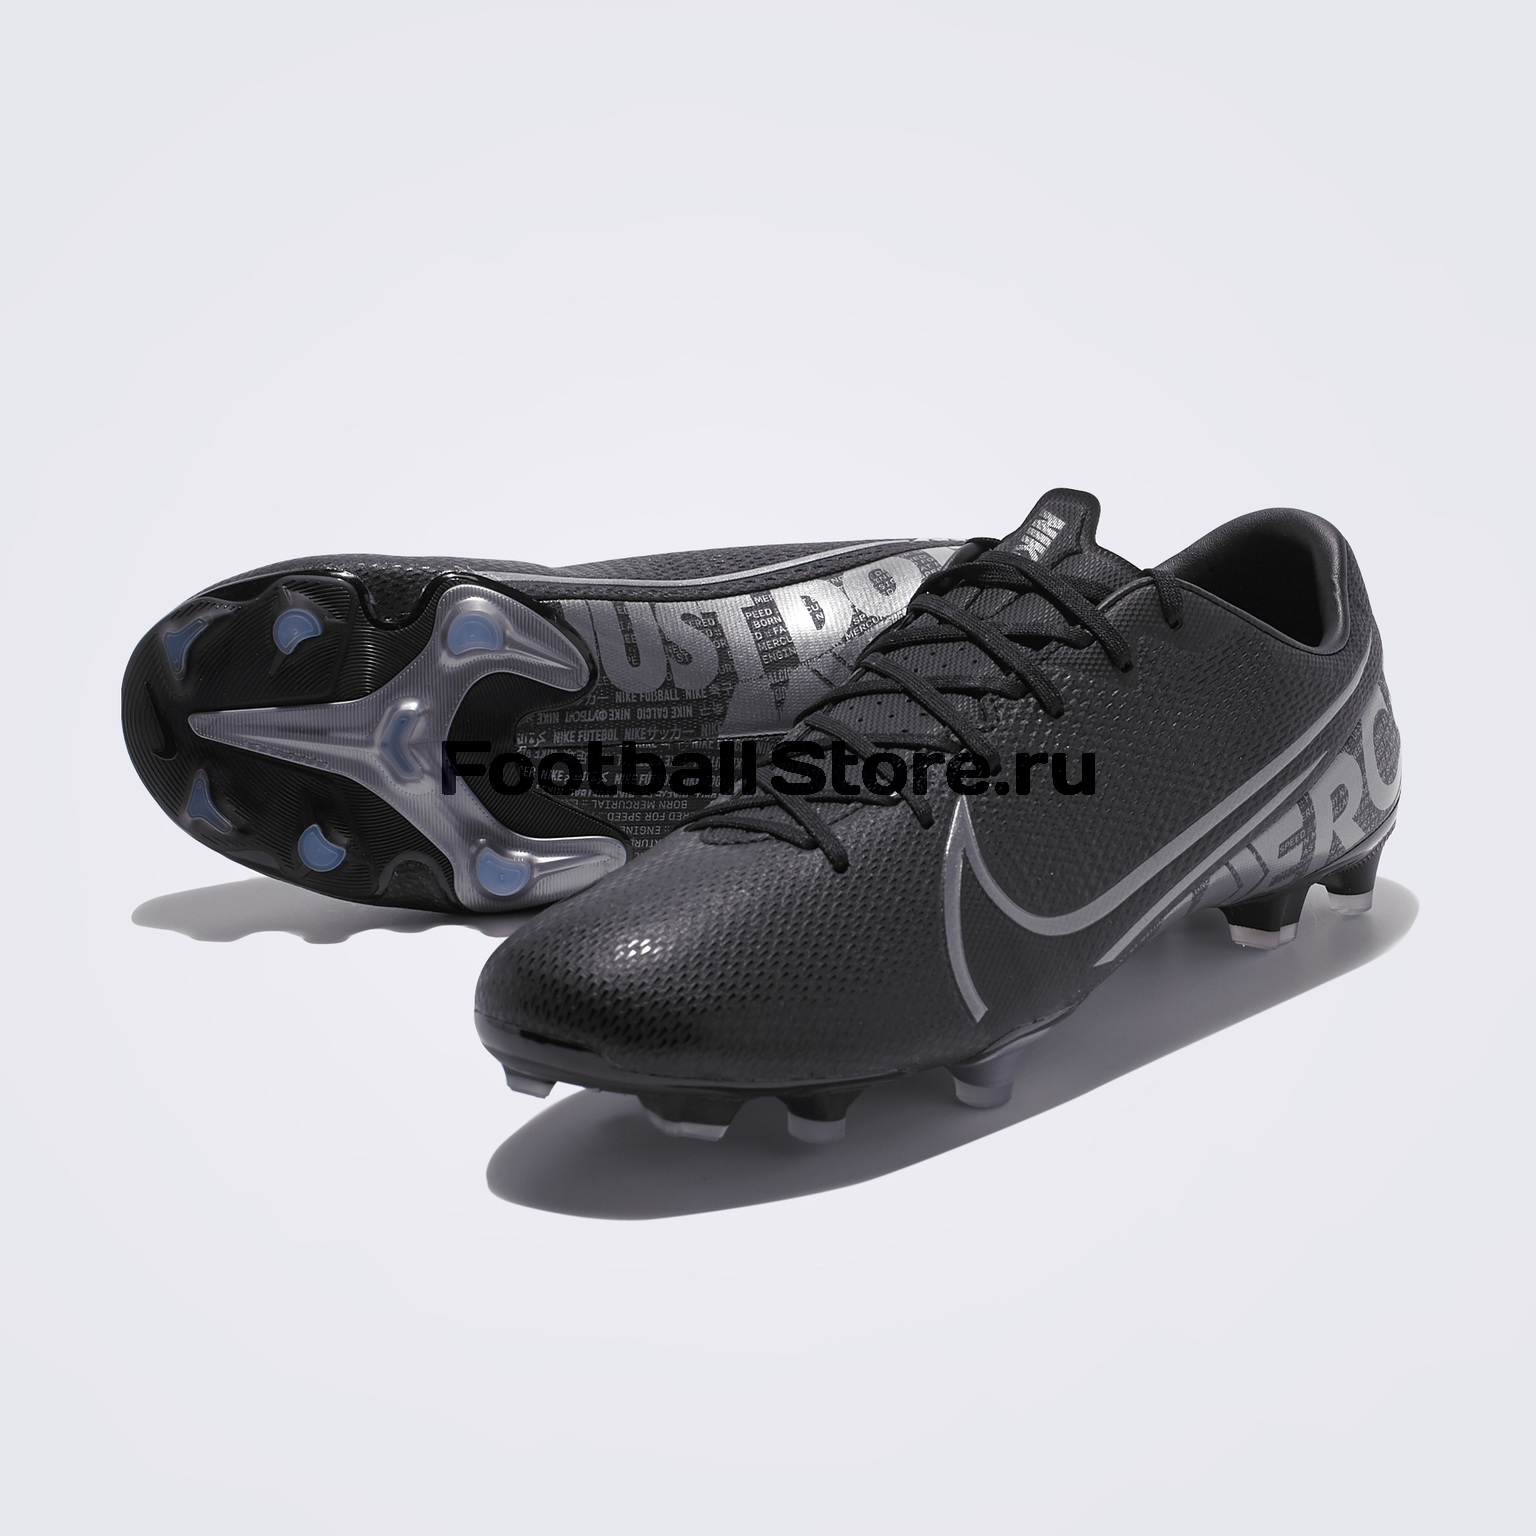 Бутсы Nike Vapor 13 Academy FG/MG AT5269-001